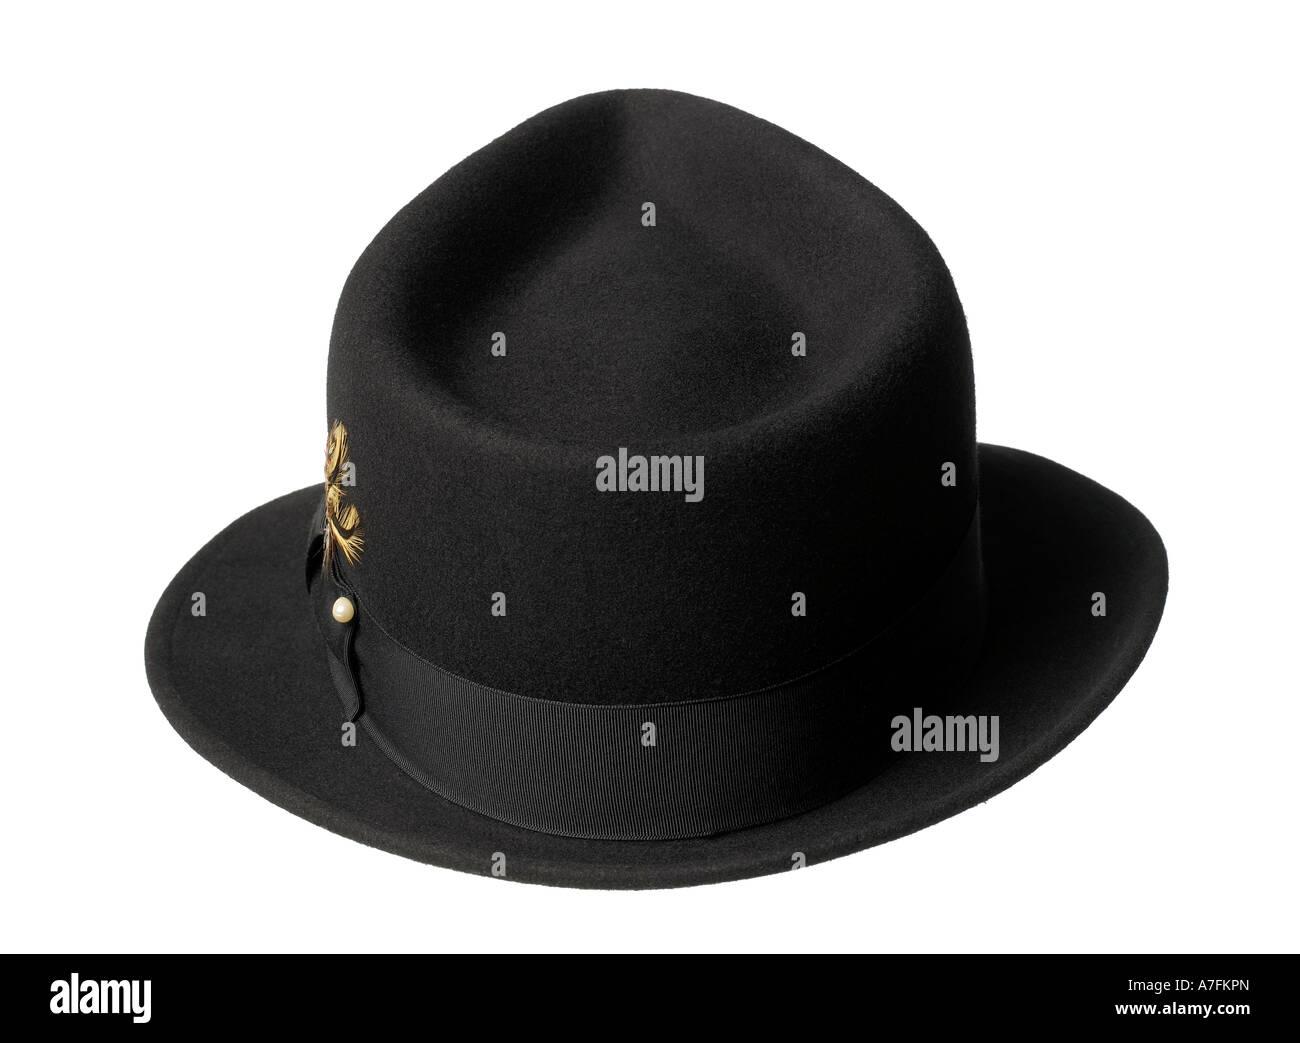 Hat Men's Black Felt Fedora Accessory - Stock Image